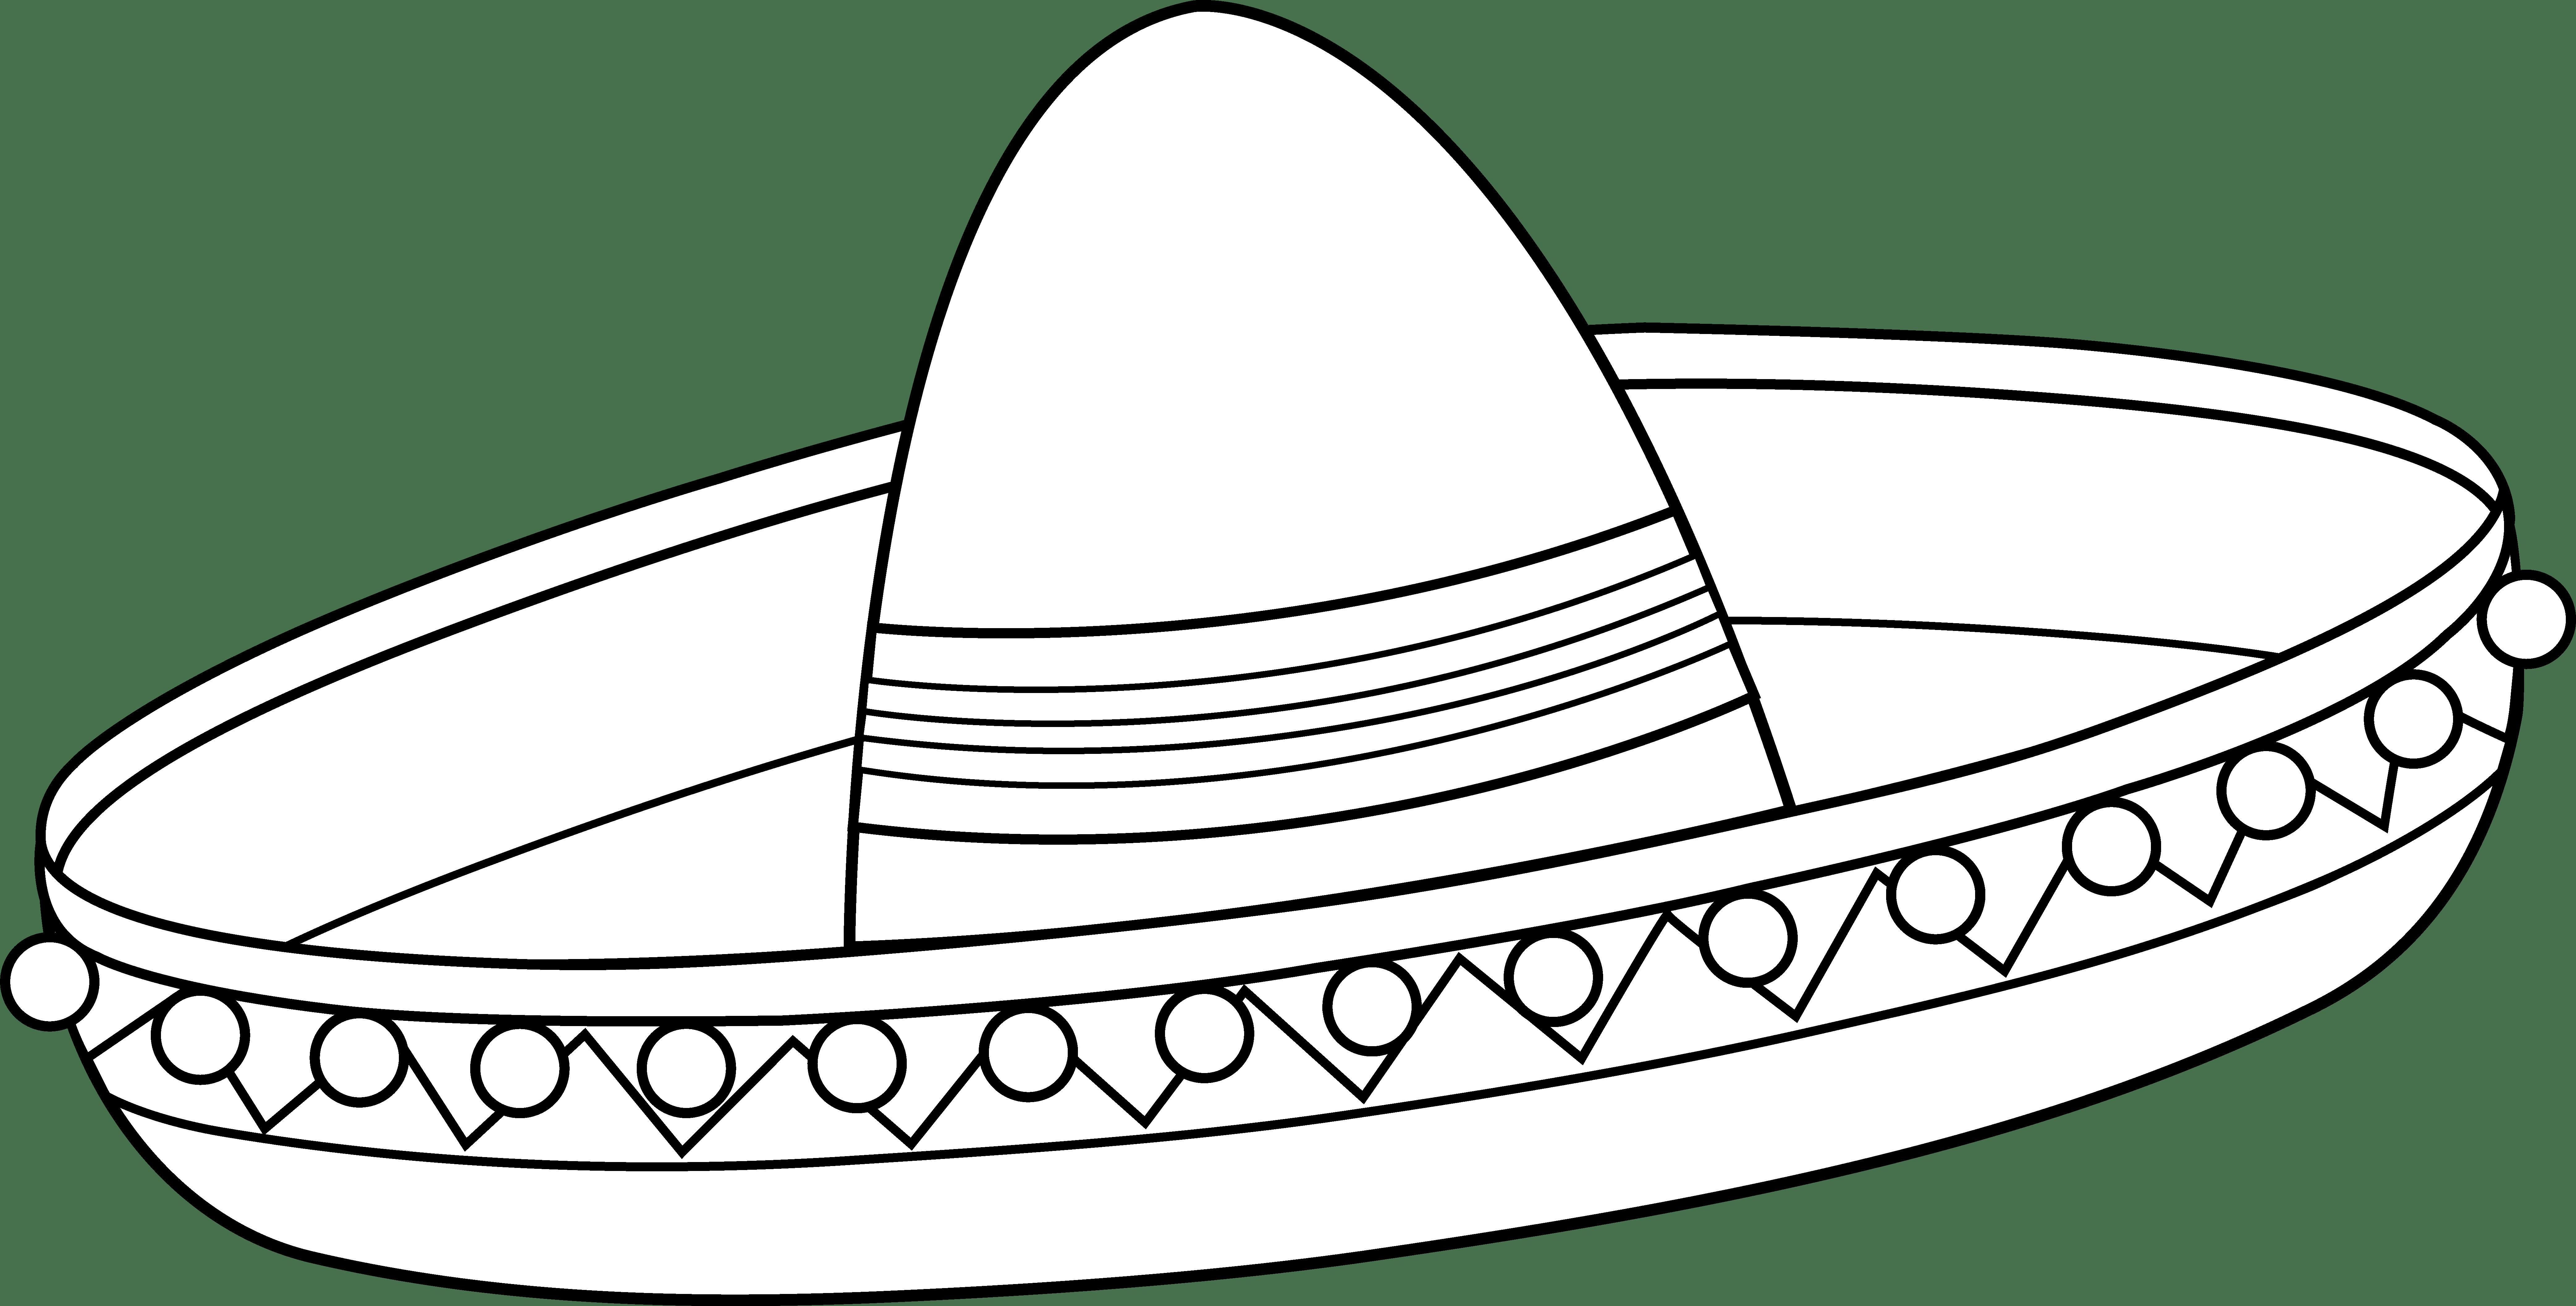 Free Mexican Sombrero Clipart Download Free Clip Art